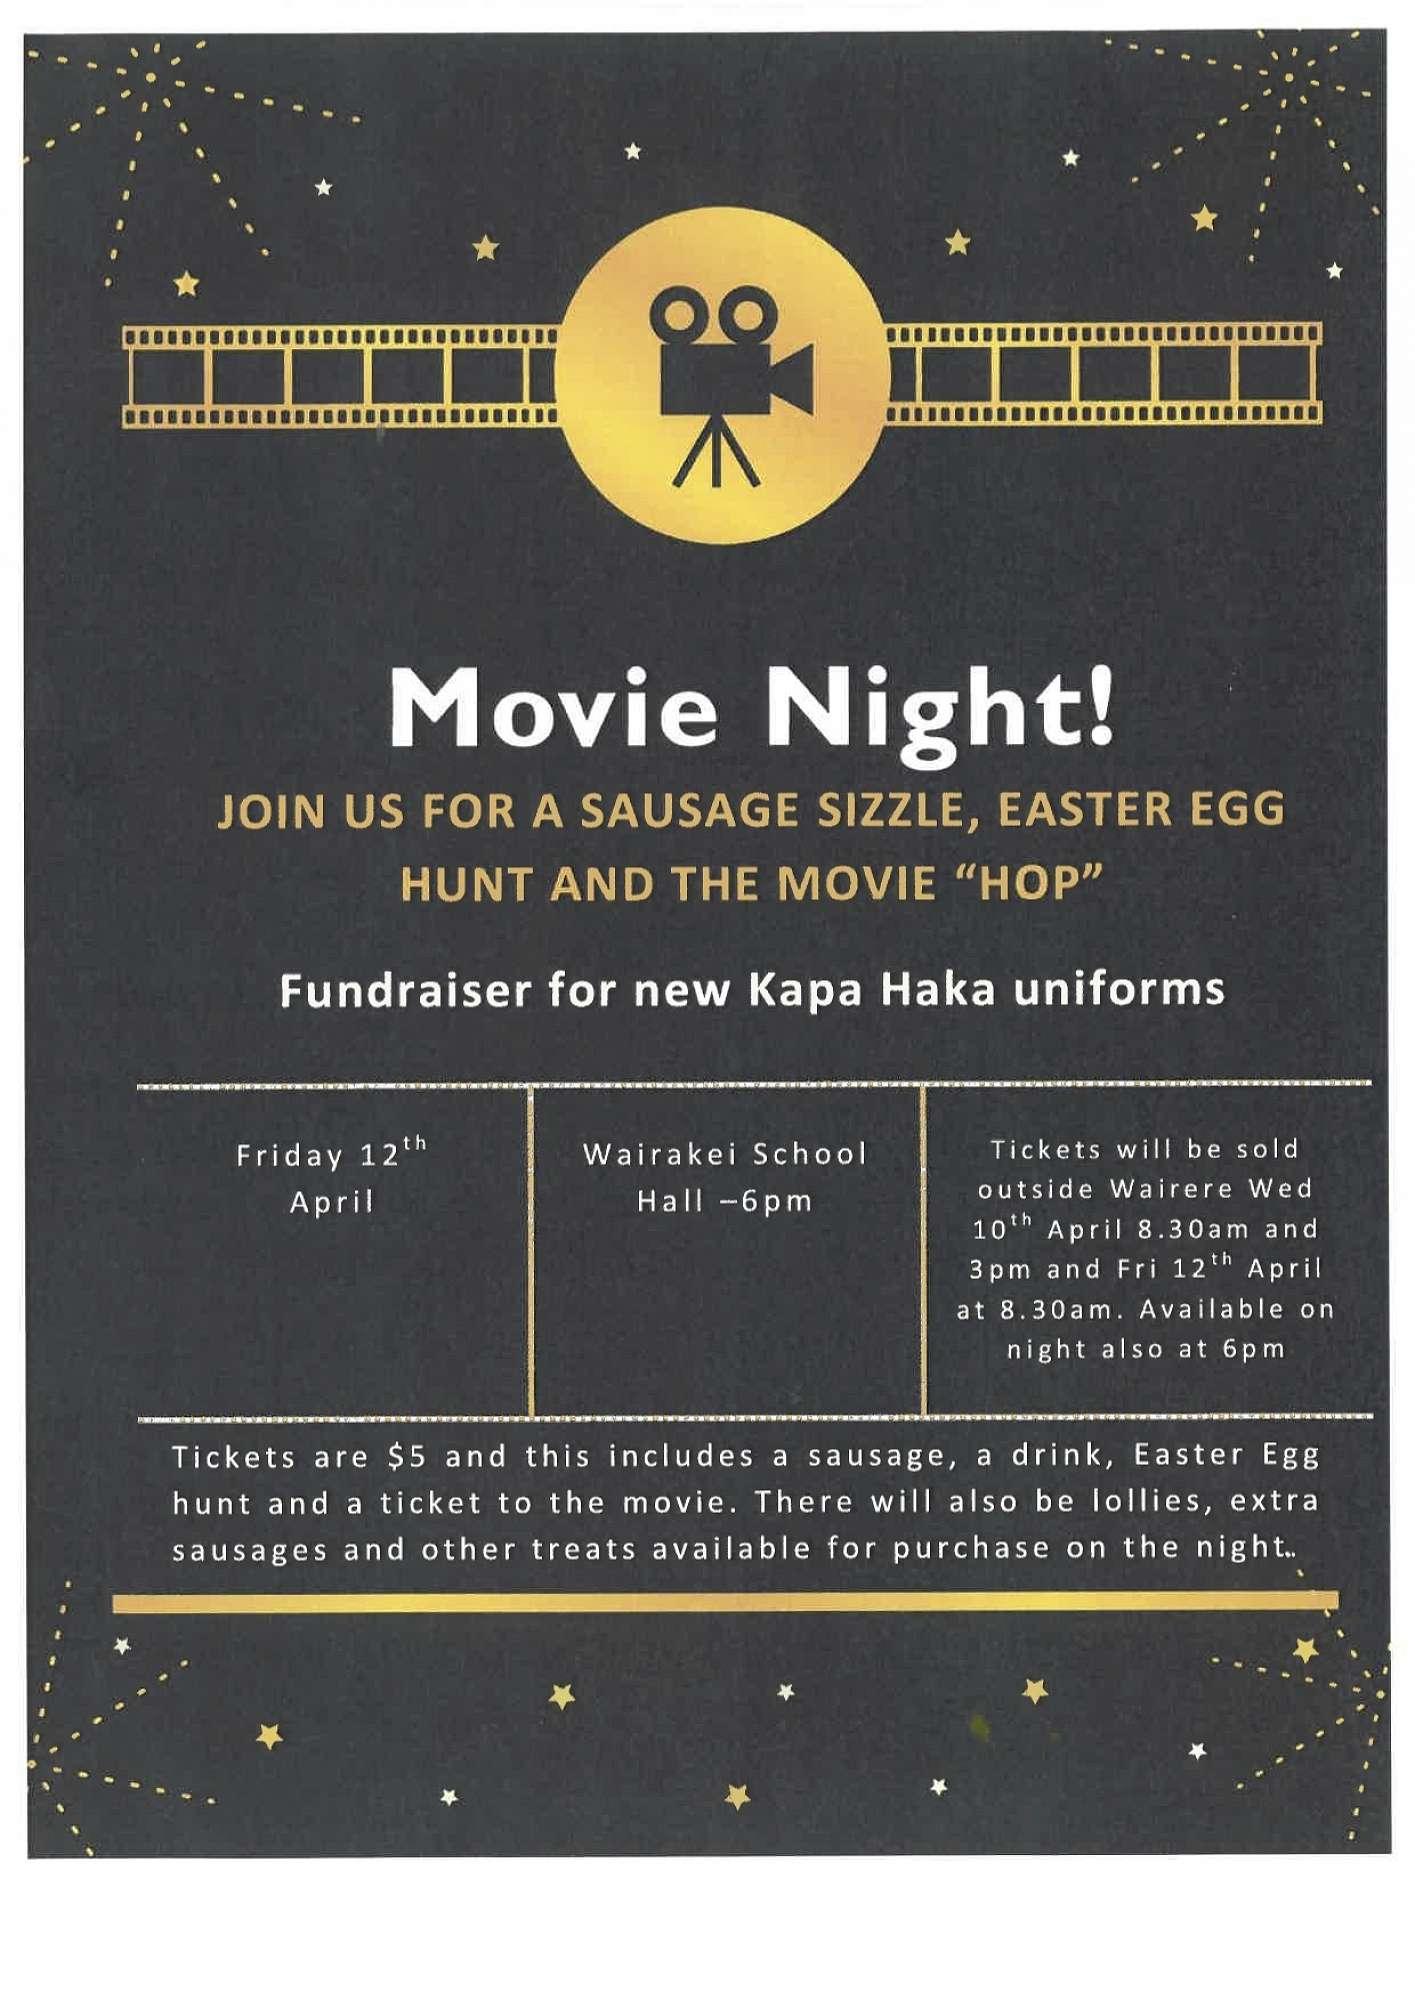 Movie Night - Friday 12th April